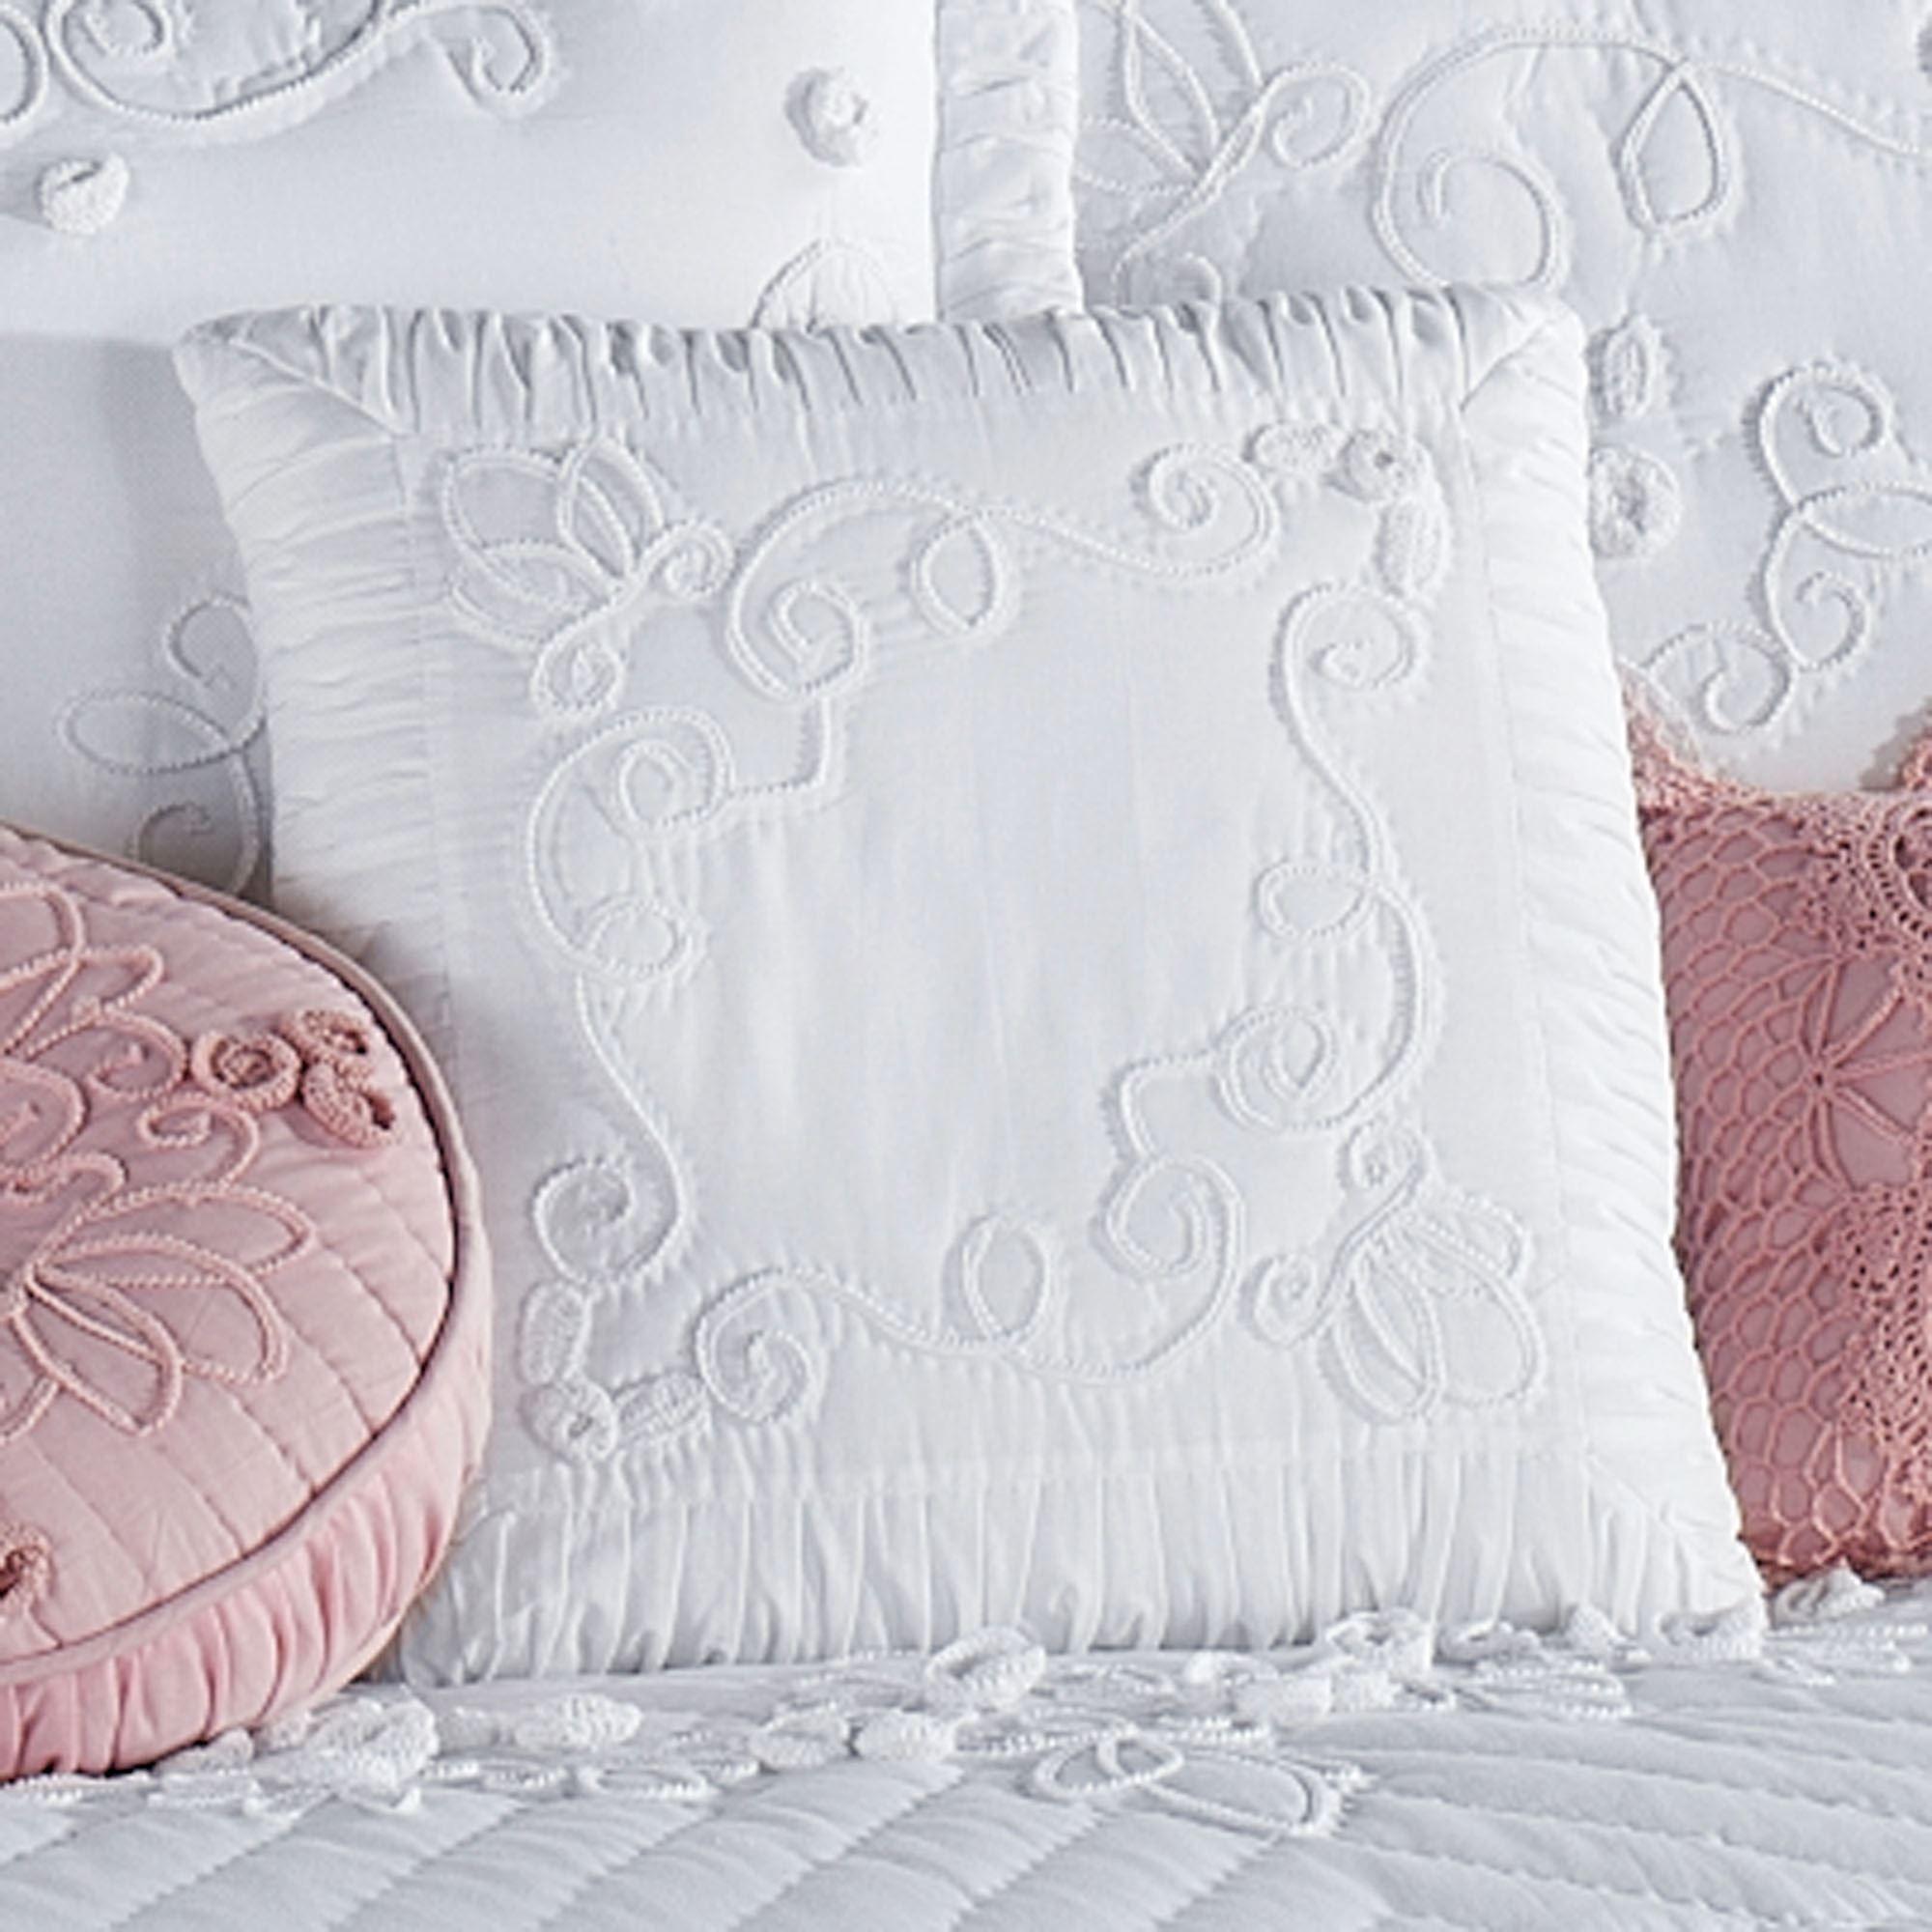 Tranquil Garden White Decorative Pillows